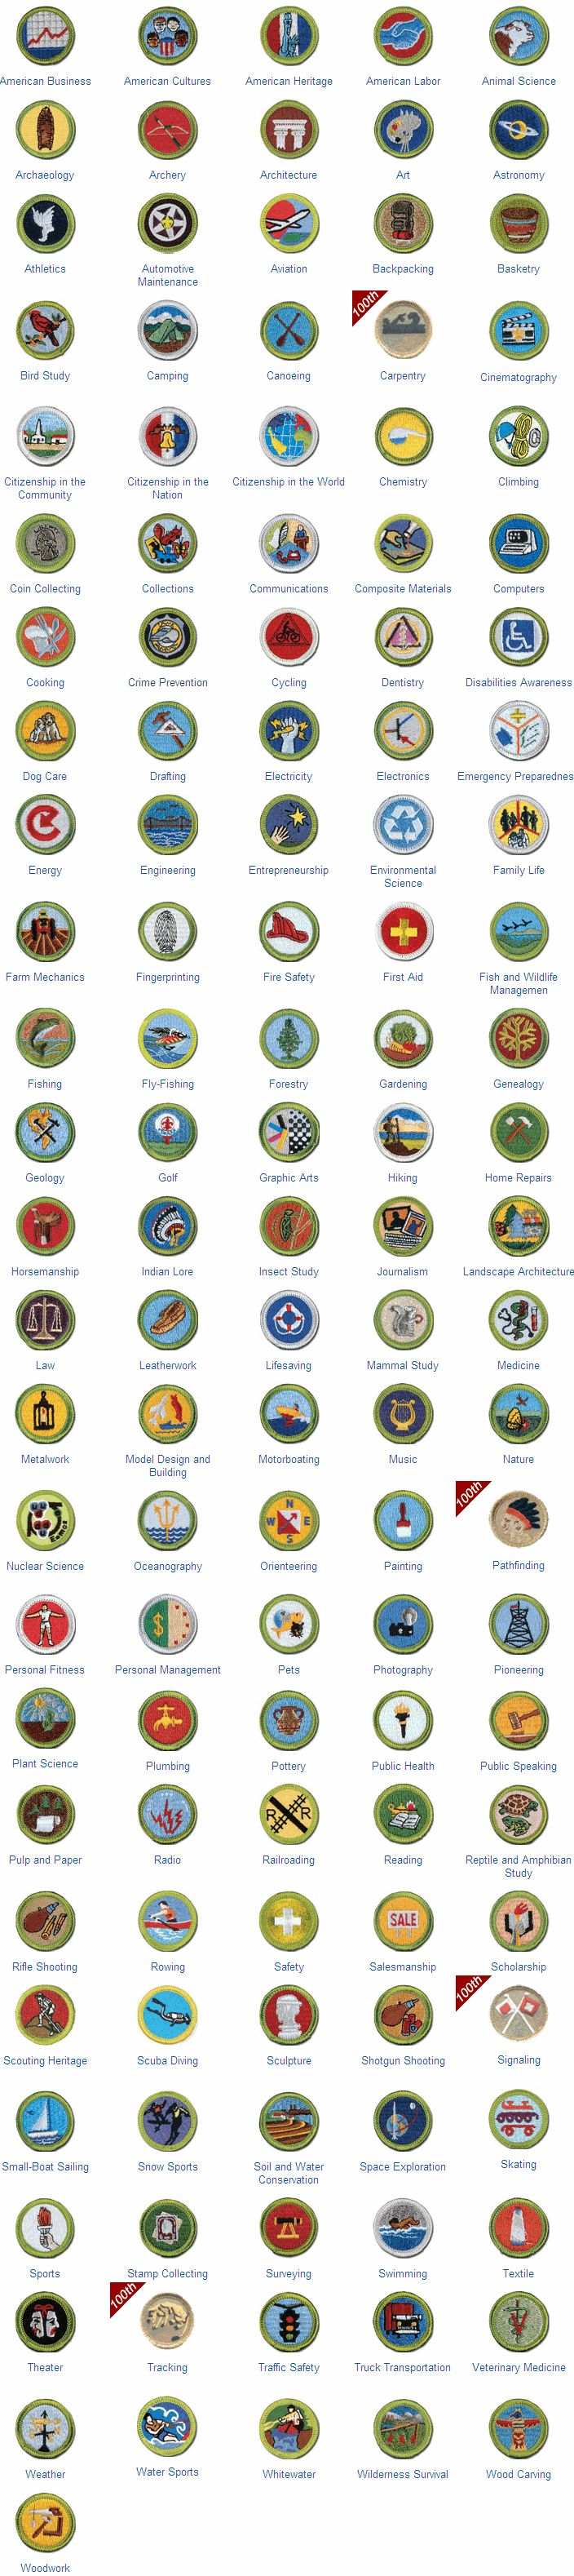 list of merit badges 2010 great collection badges and names boy scout troop 11 in alameda. Black Bedroom Furniture Sets. Home Design Ideas